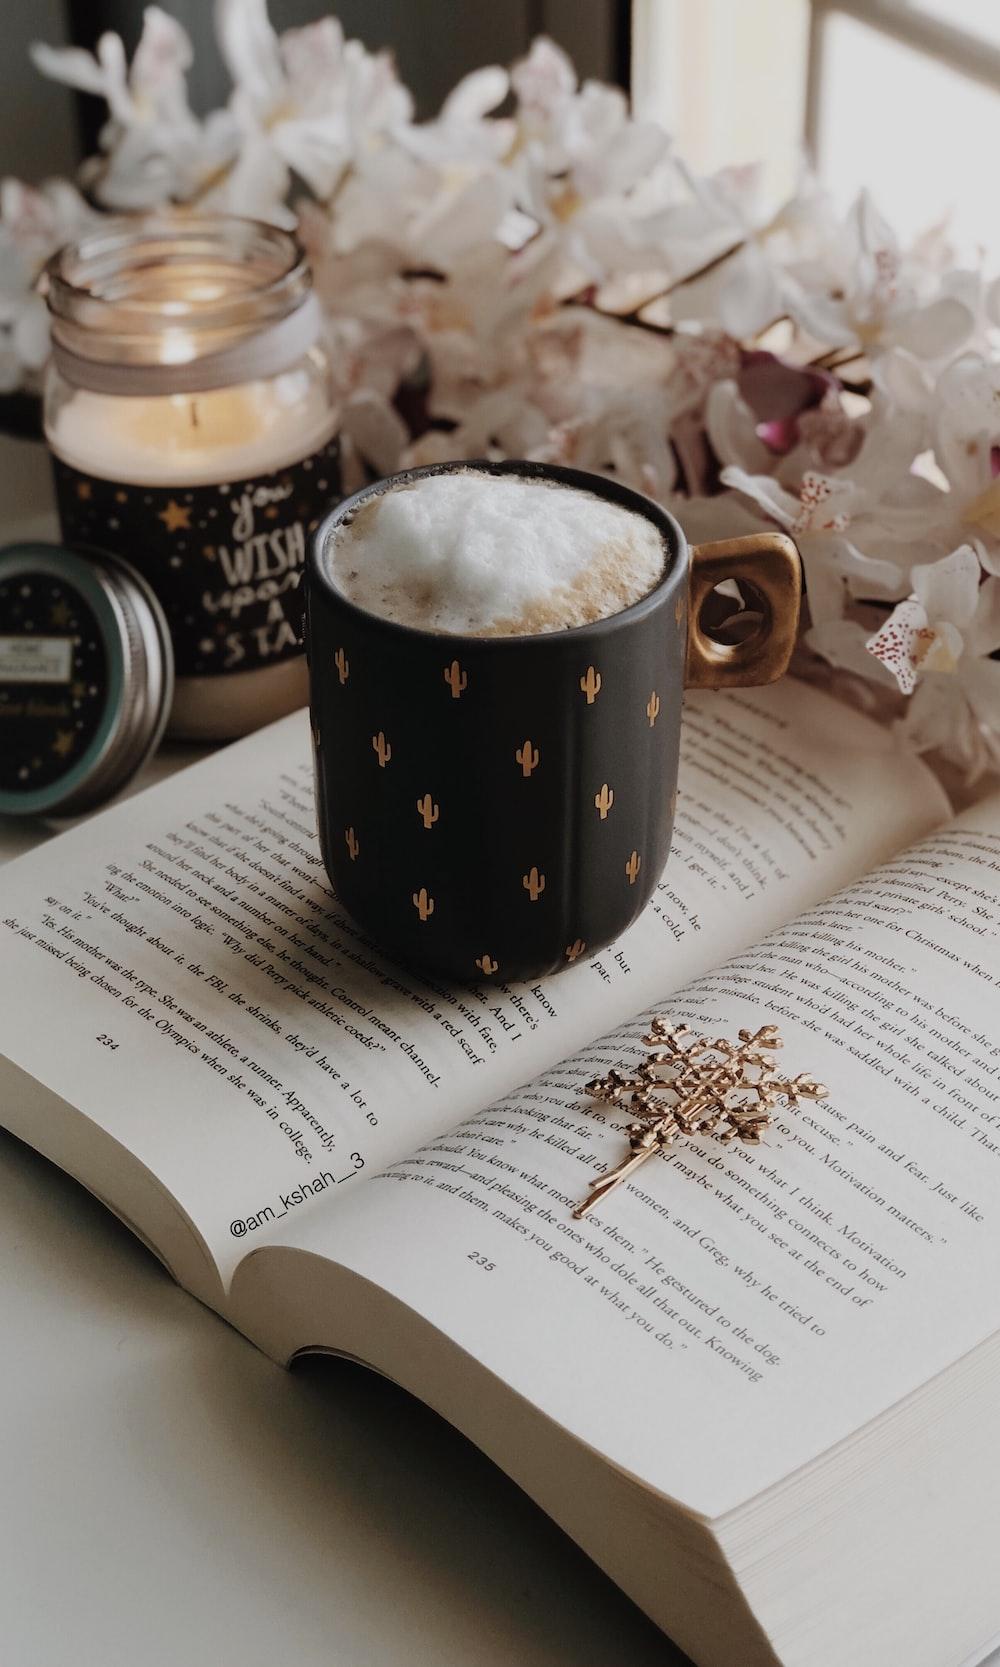 mug on book